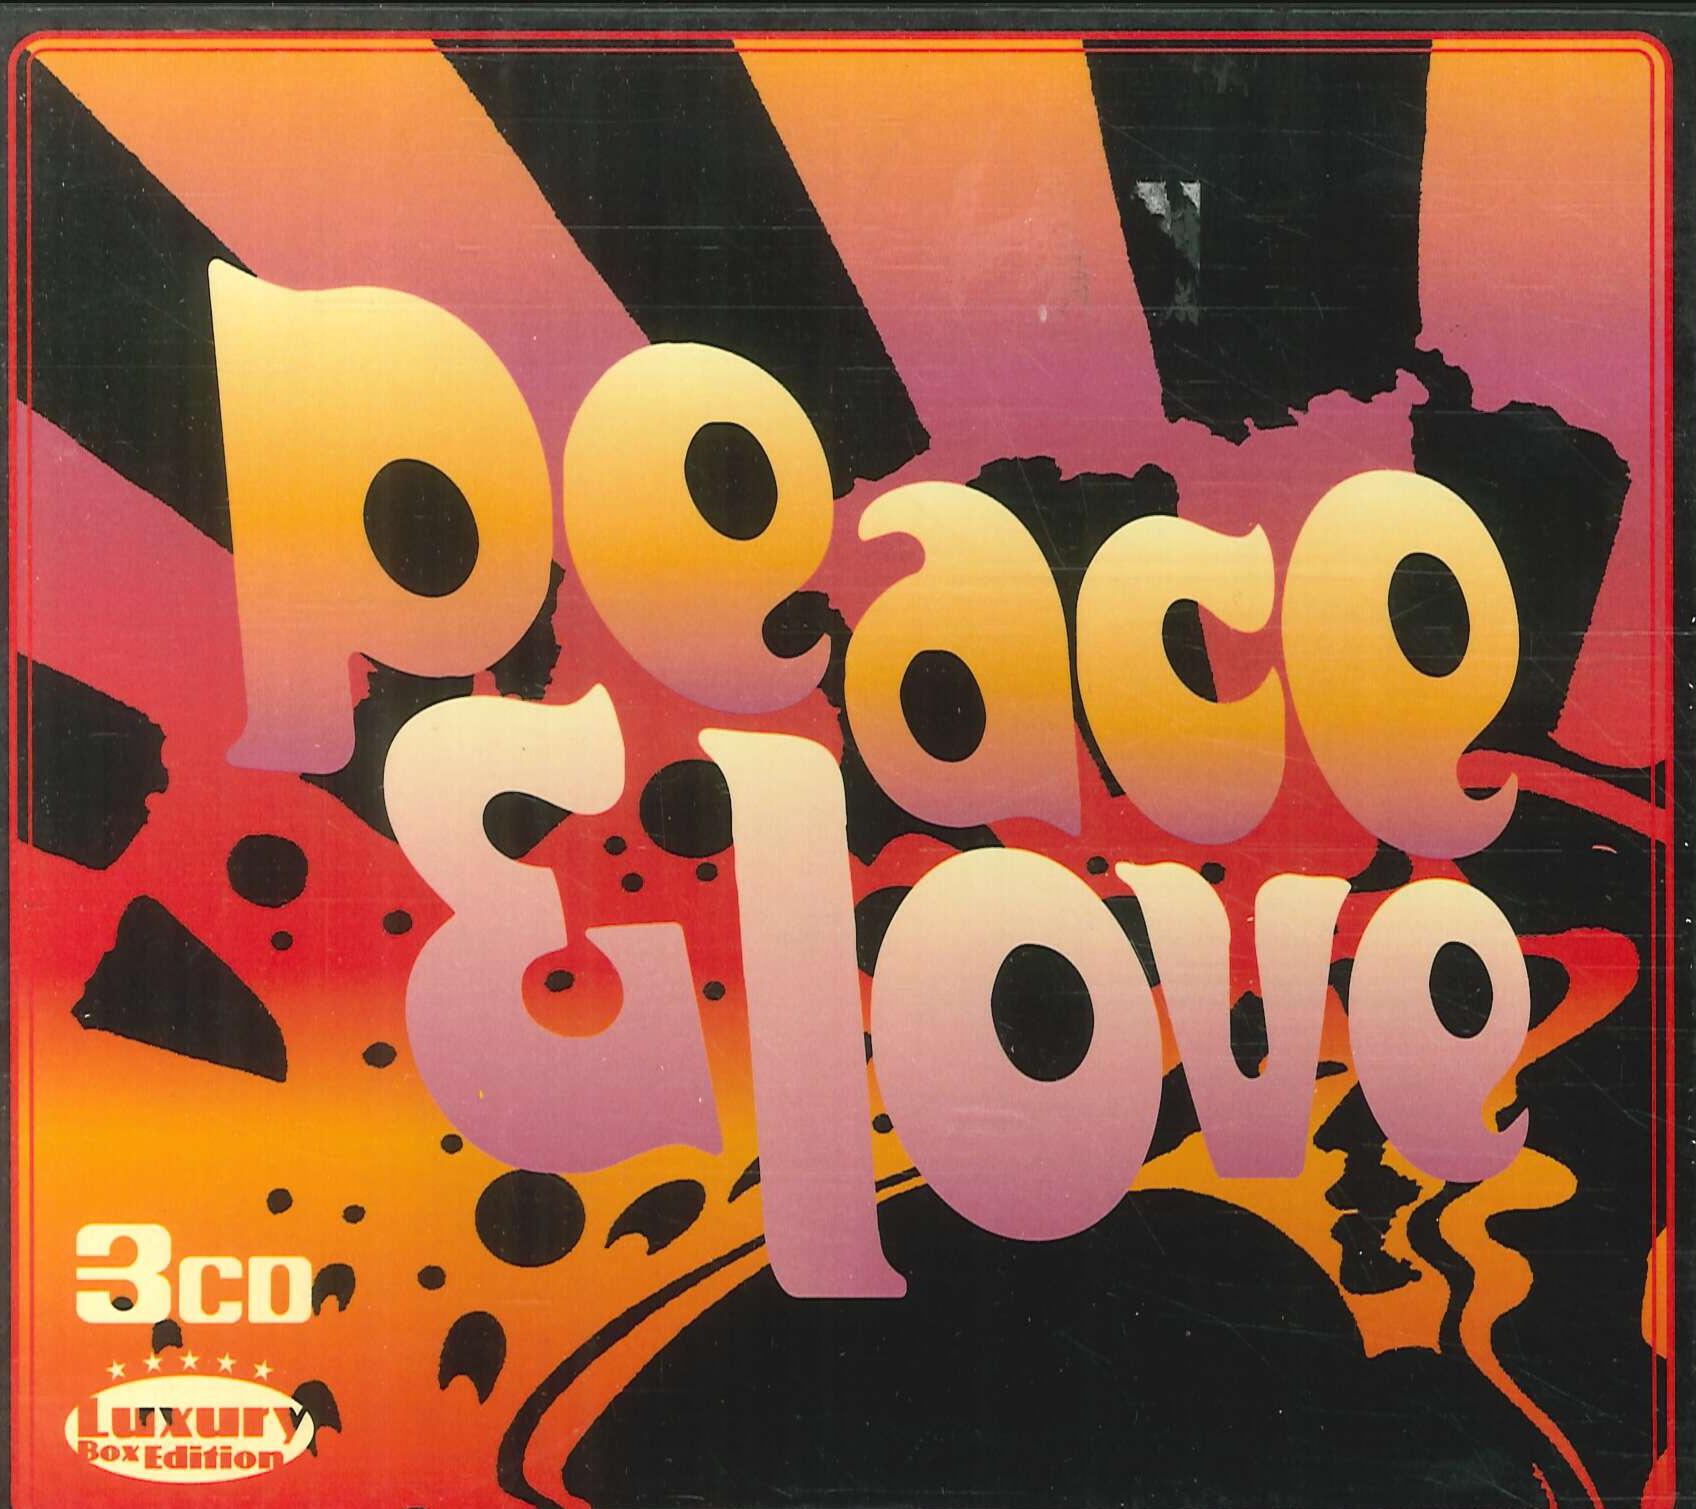 Peace & Love 3CD